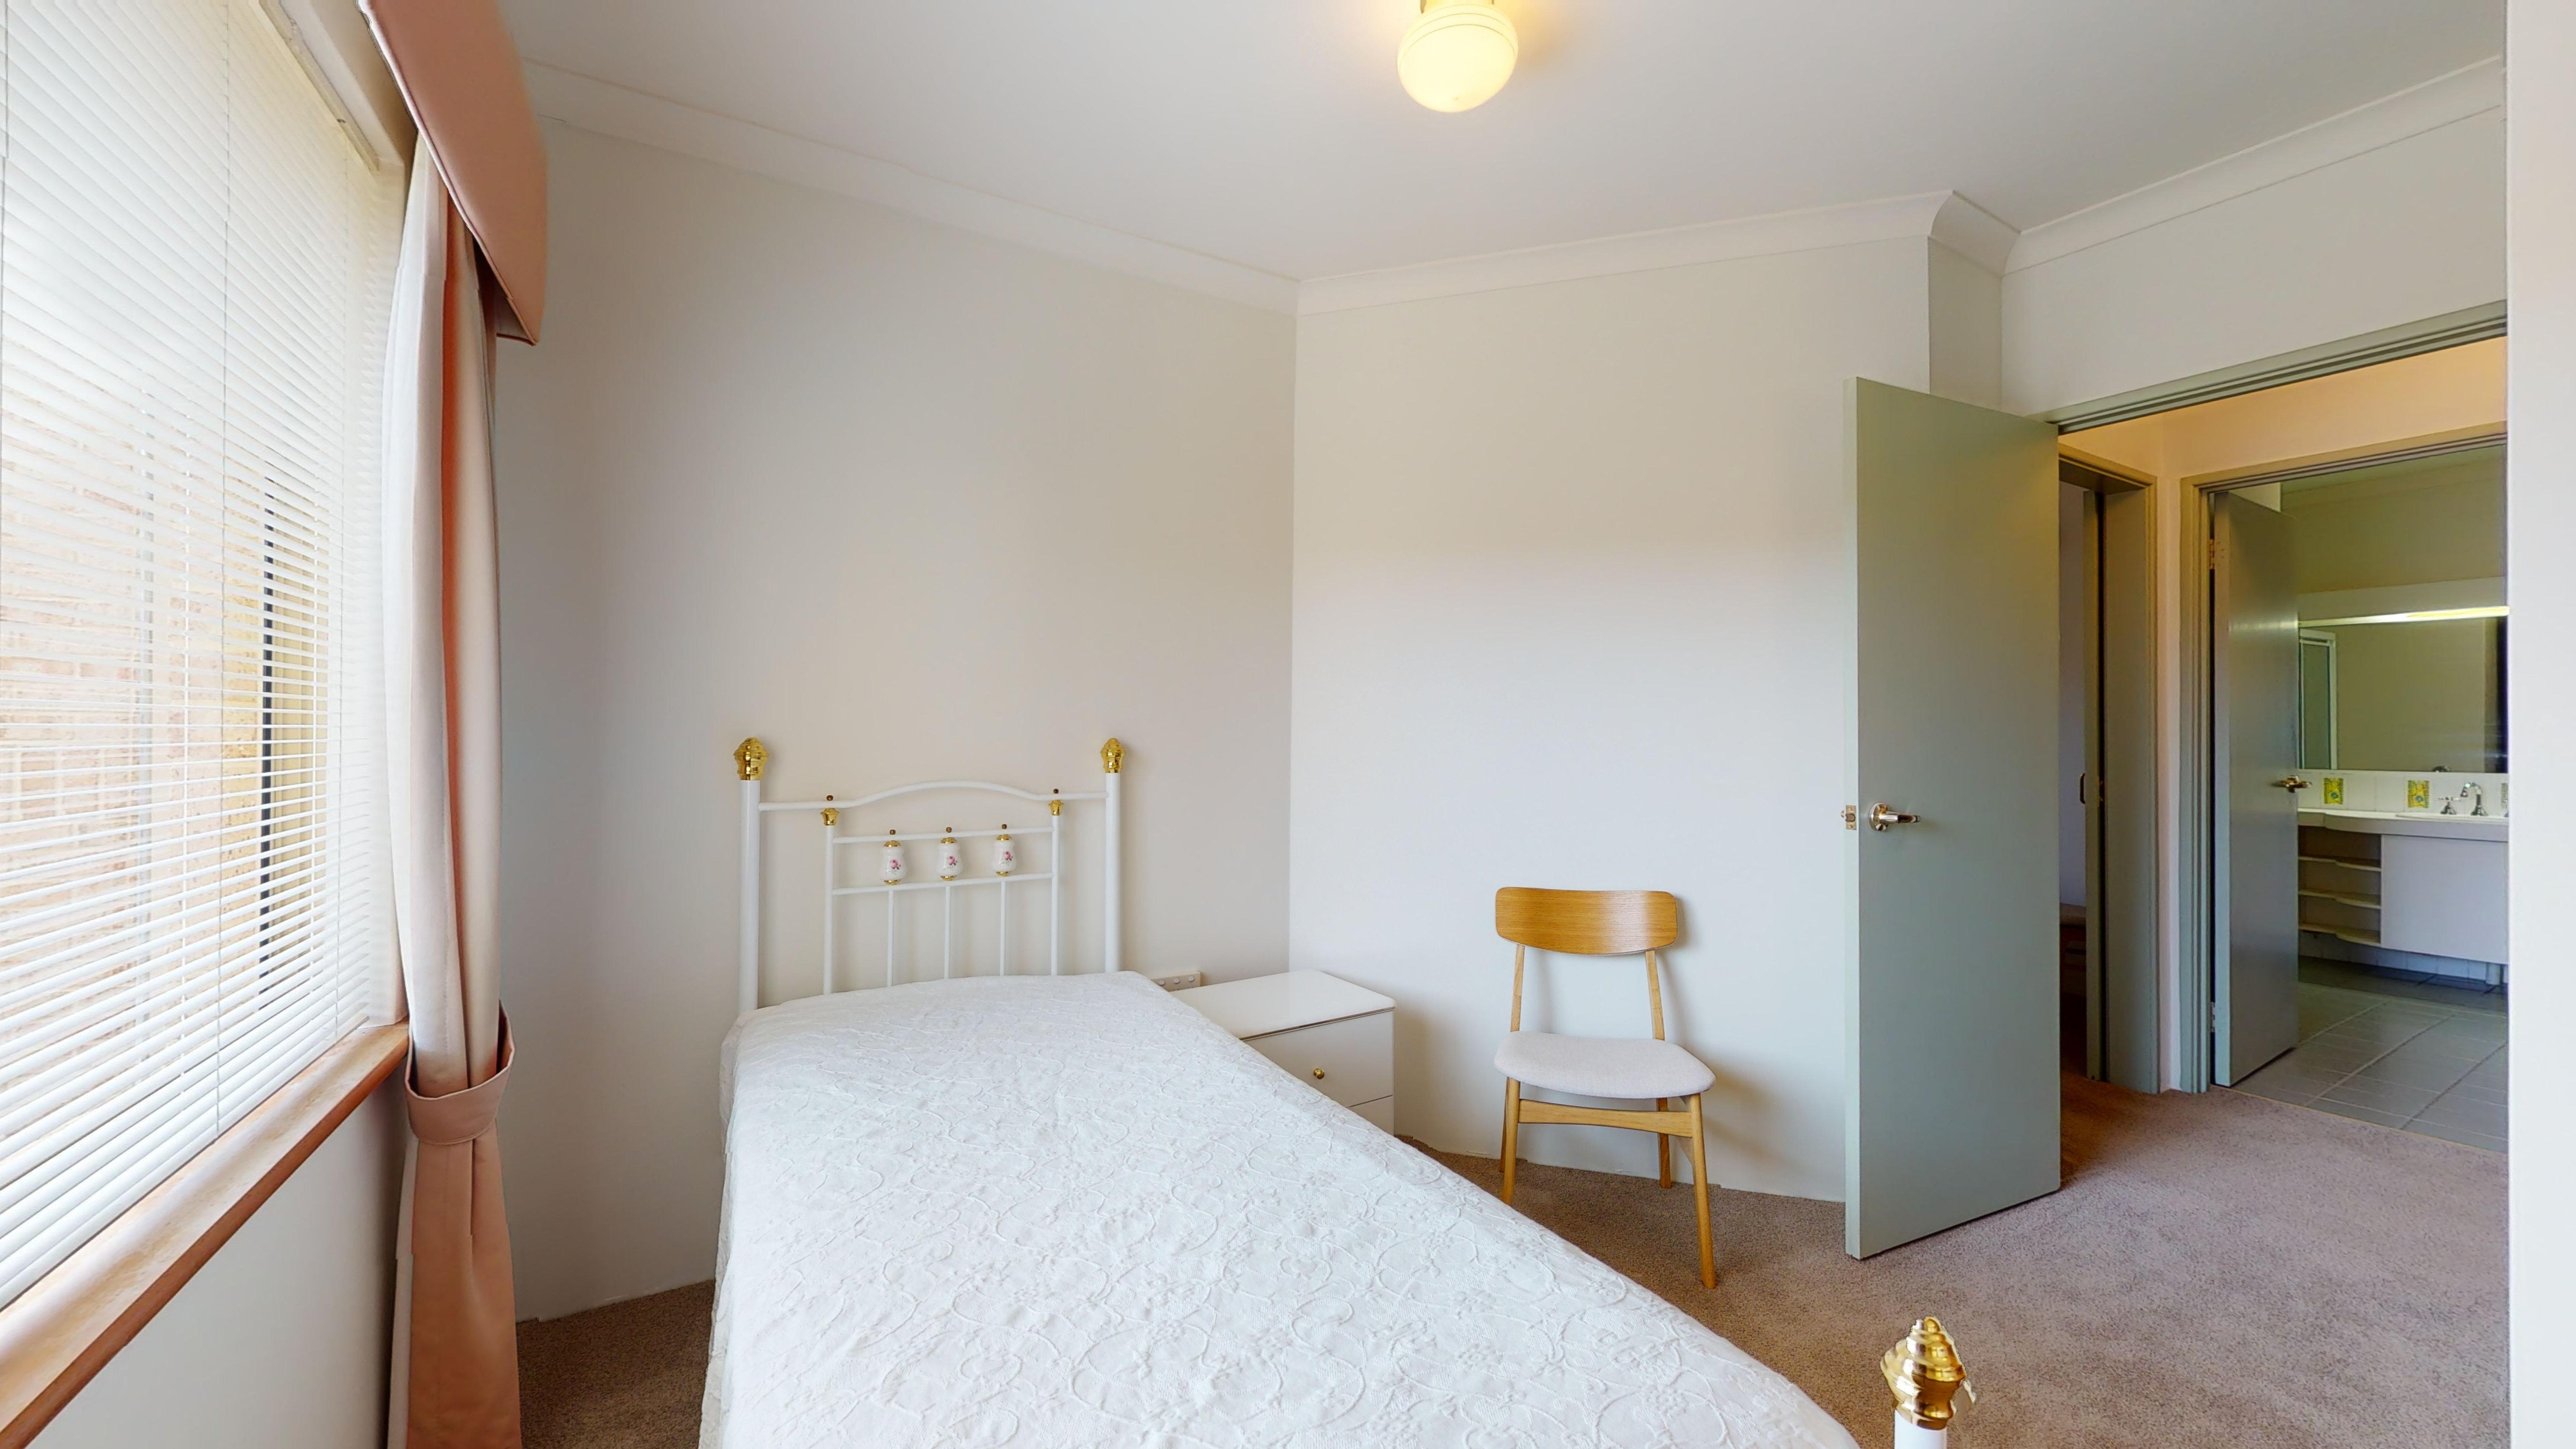 29959141 1622442295 29346 207 177 Dampier Avenue Kallaroo Bedroom Two